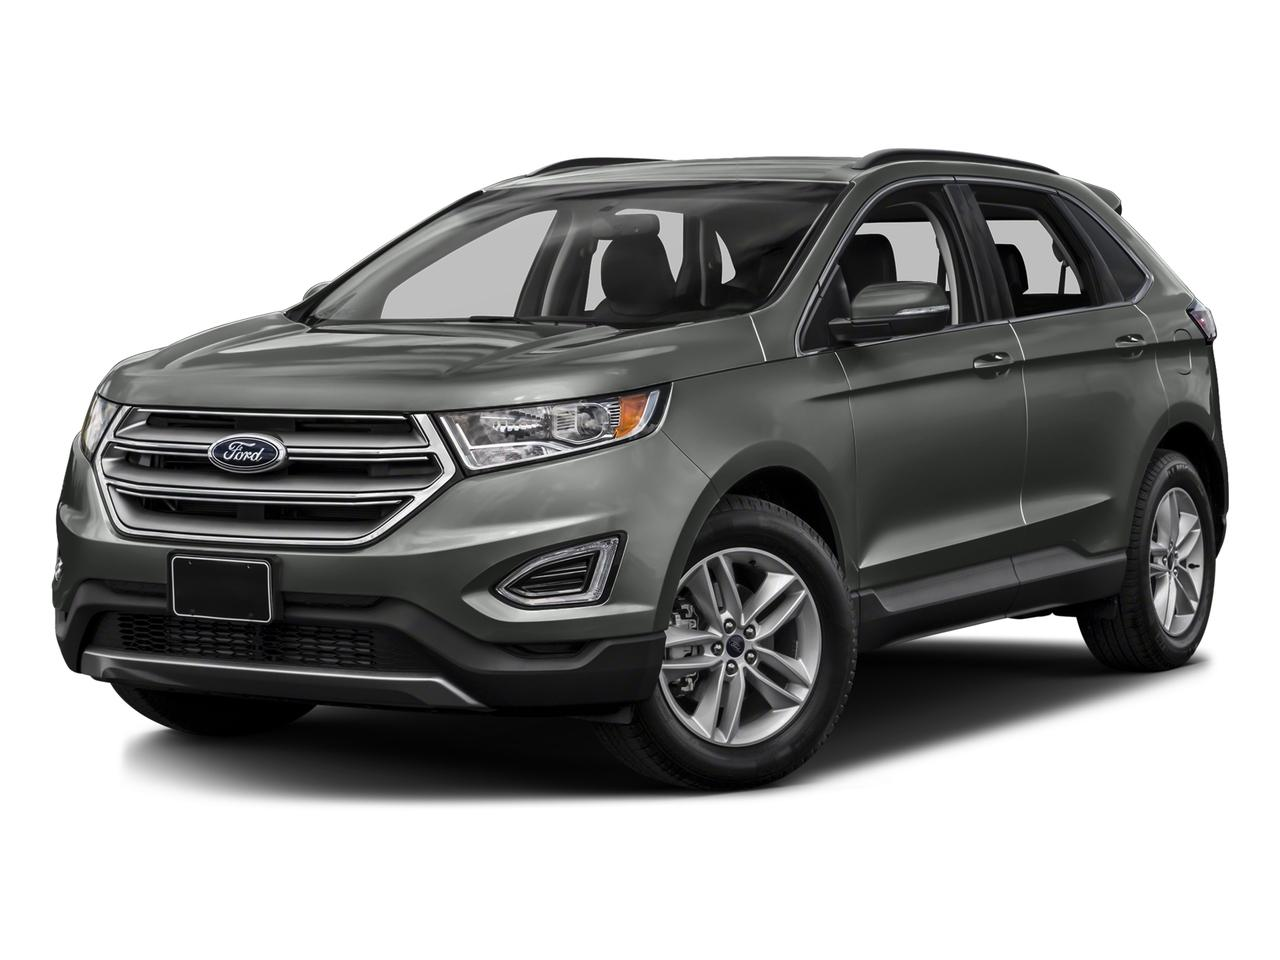 2017 Ford Edge Vehicle Photo in MEDINA, OH 44256-9631